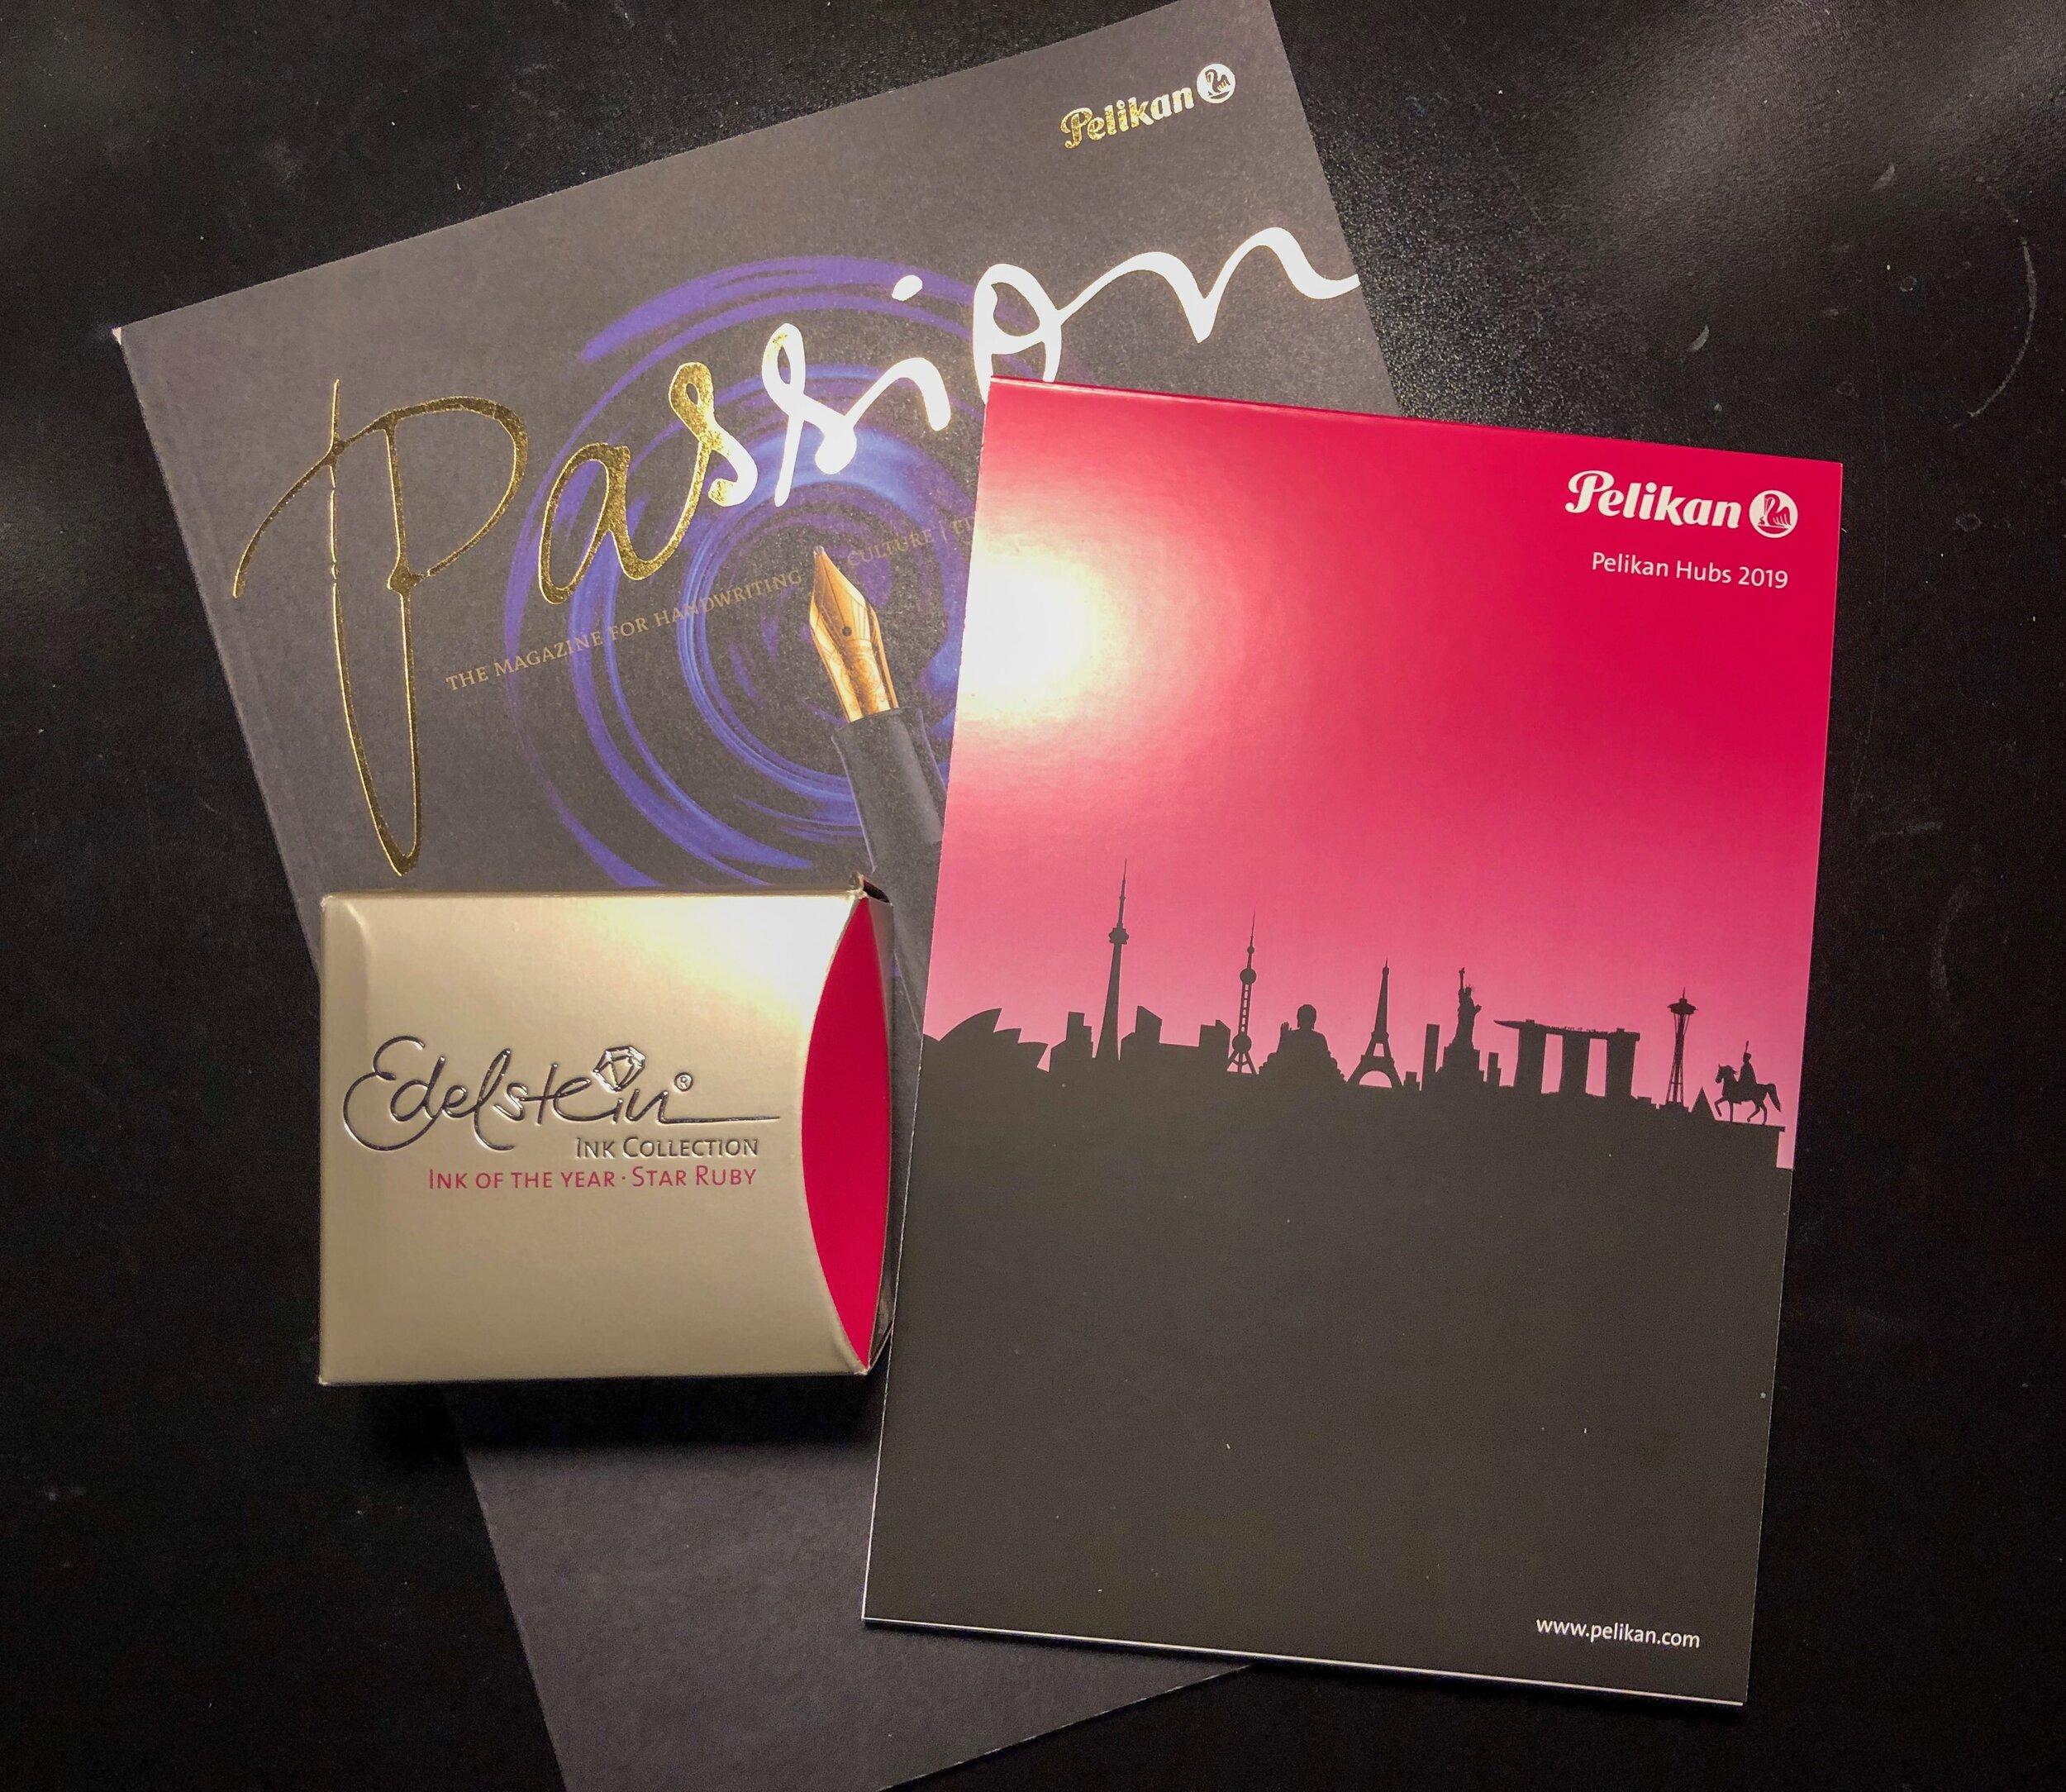 Pelikan Hub Gifts 2019 - Star Ruby